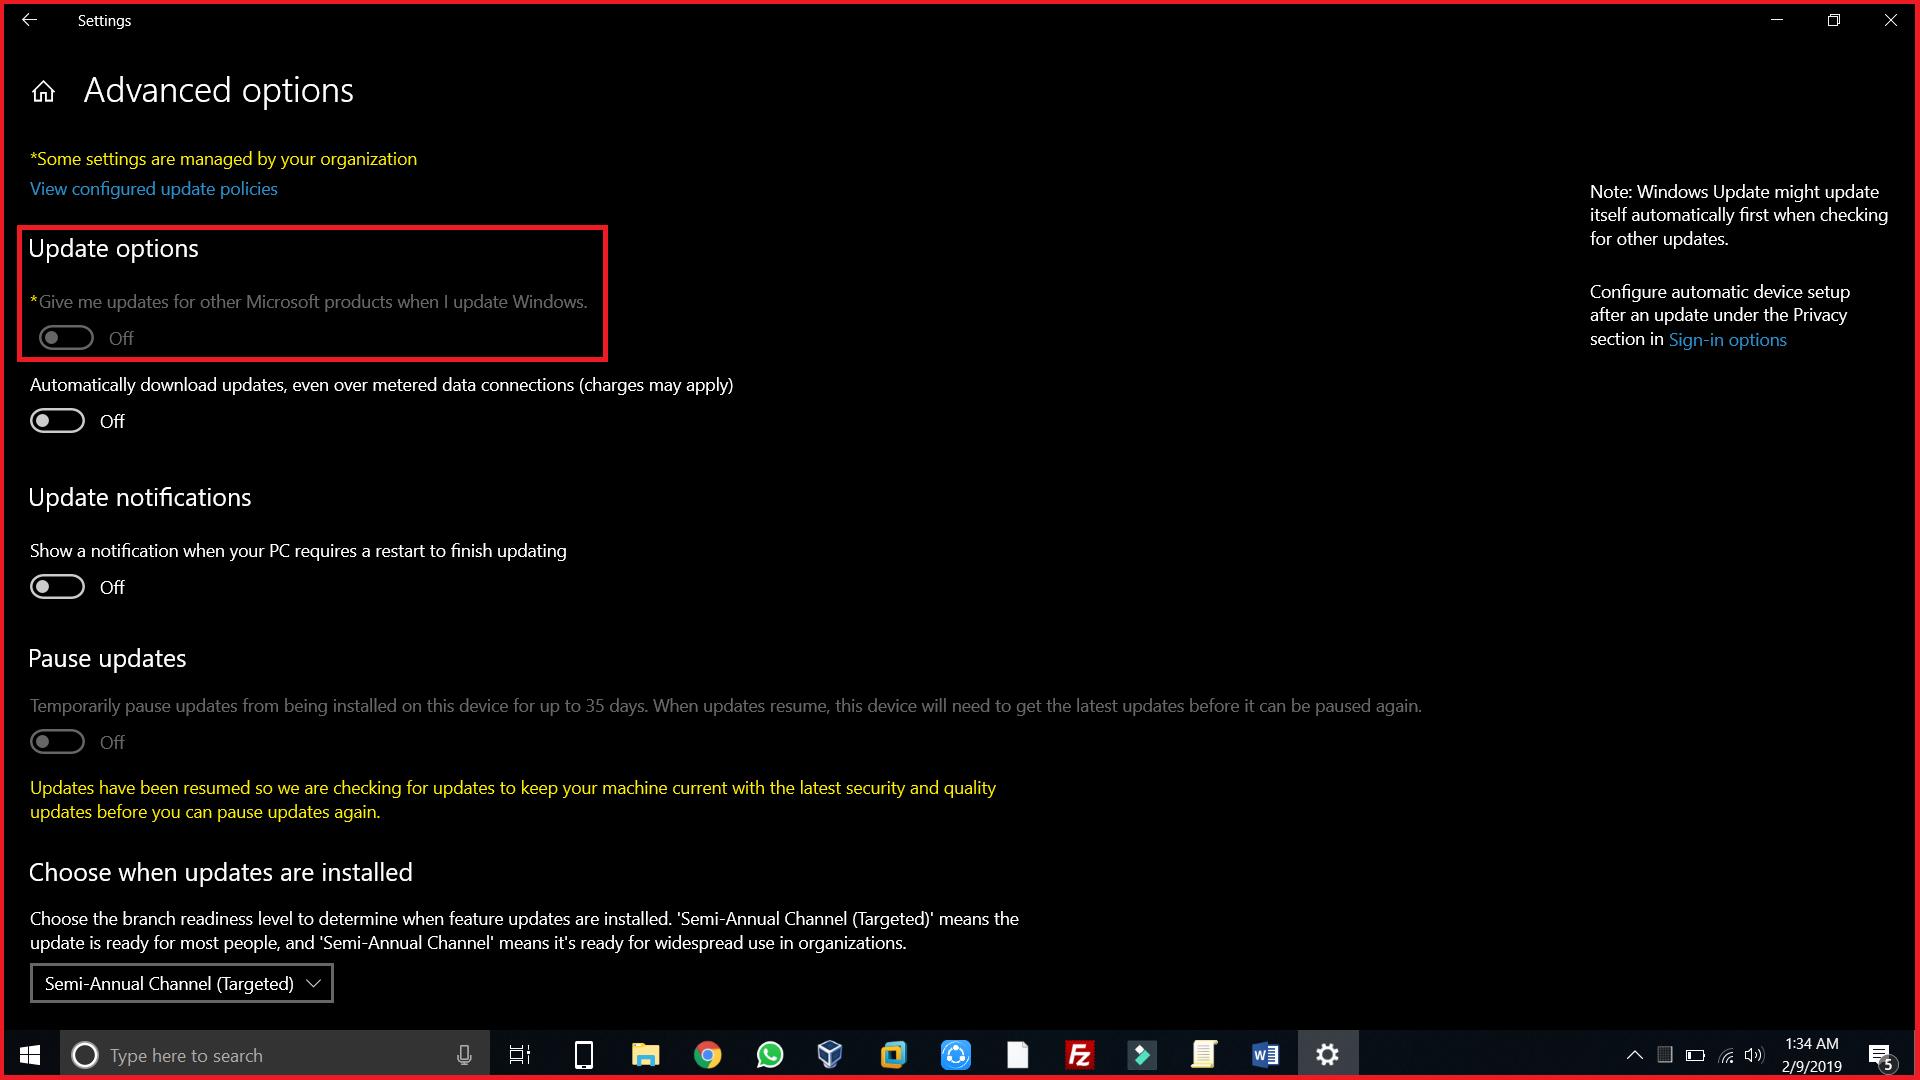 Windows Automatic Update Settings